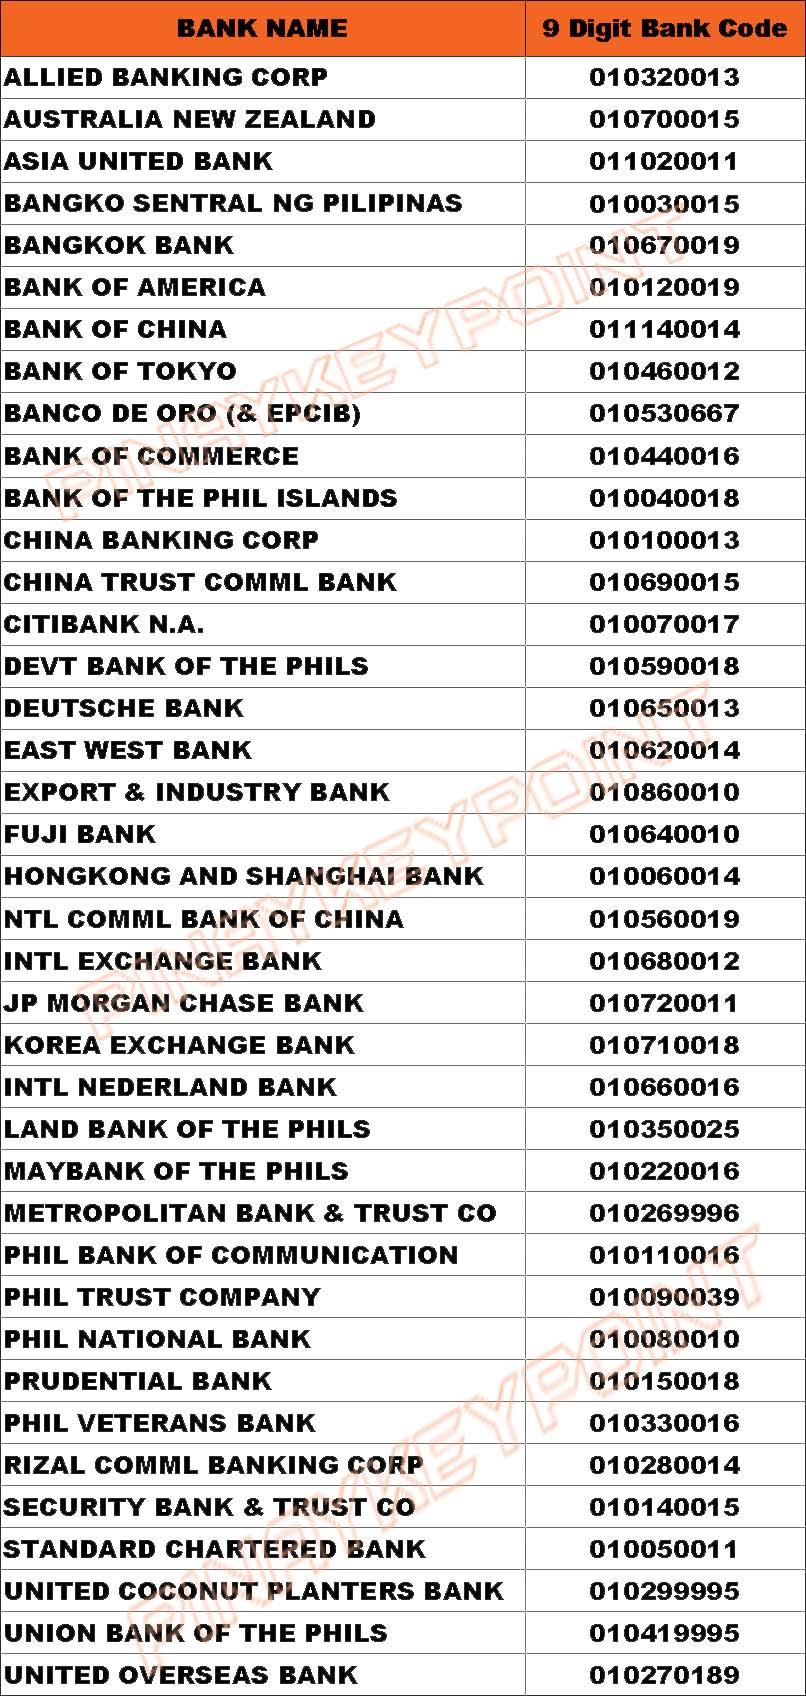 bank card verification code